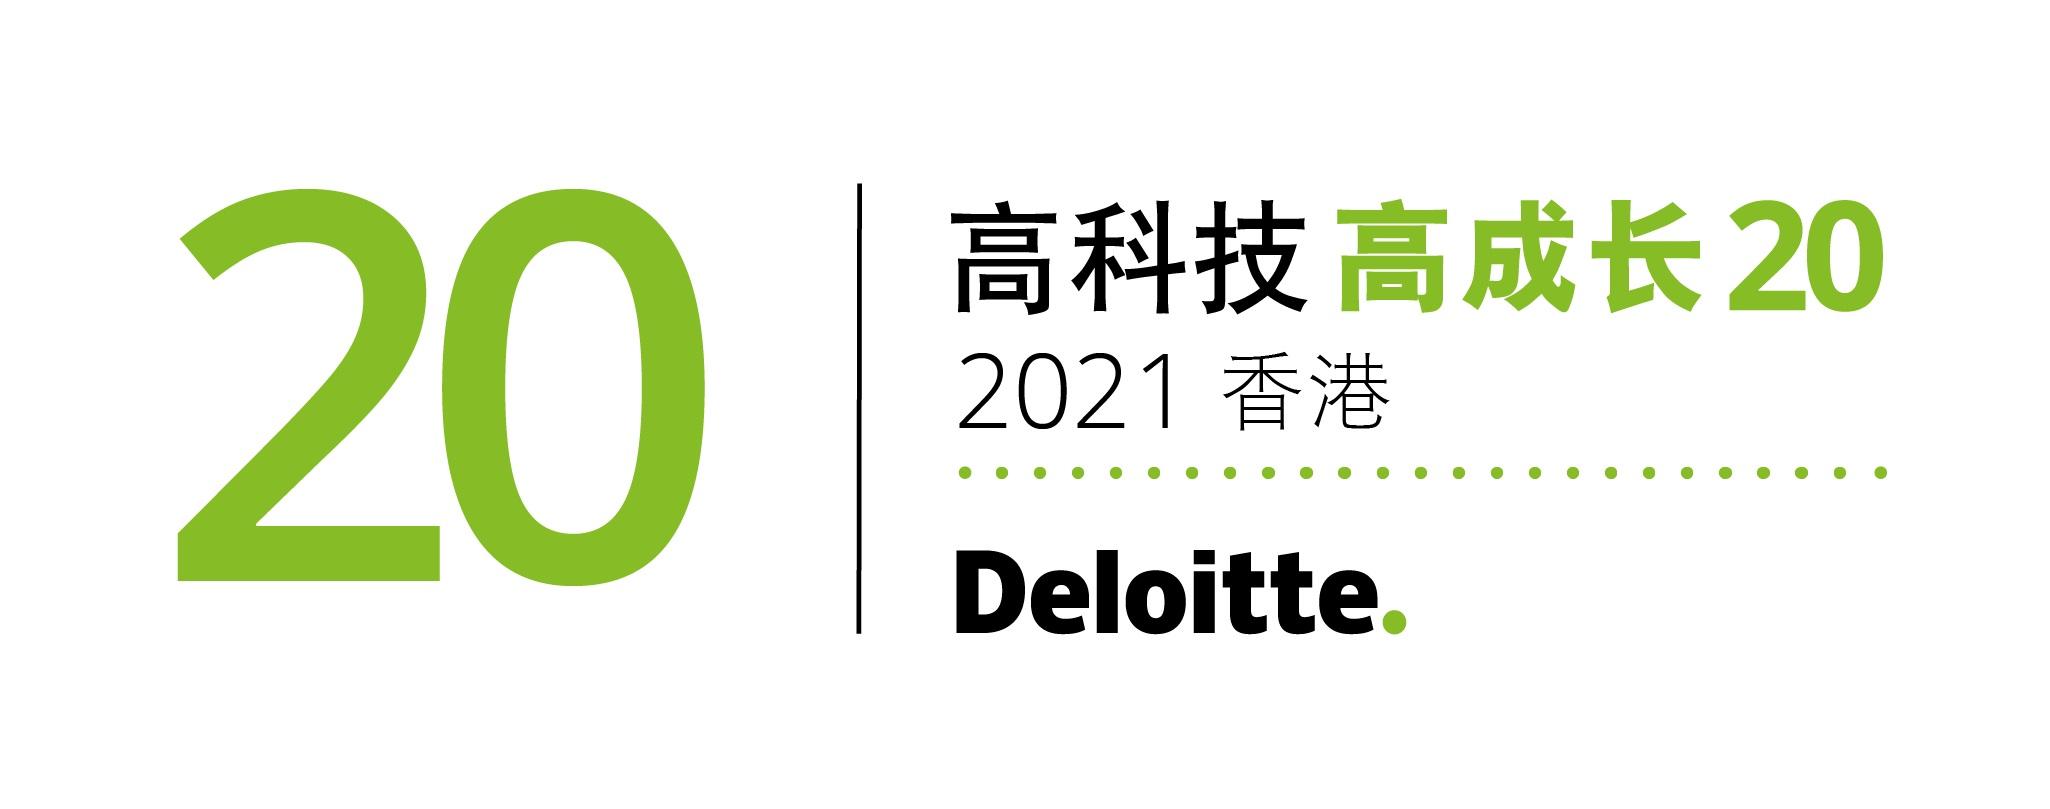 2021 Deloitte Hong Kong Technology Fast 20  Rising Star Program open for applications